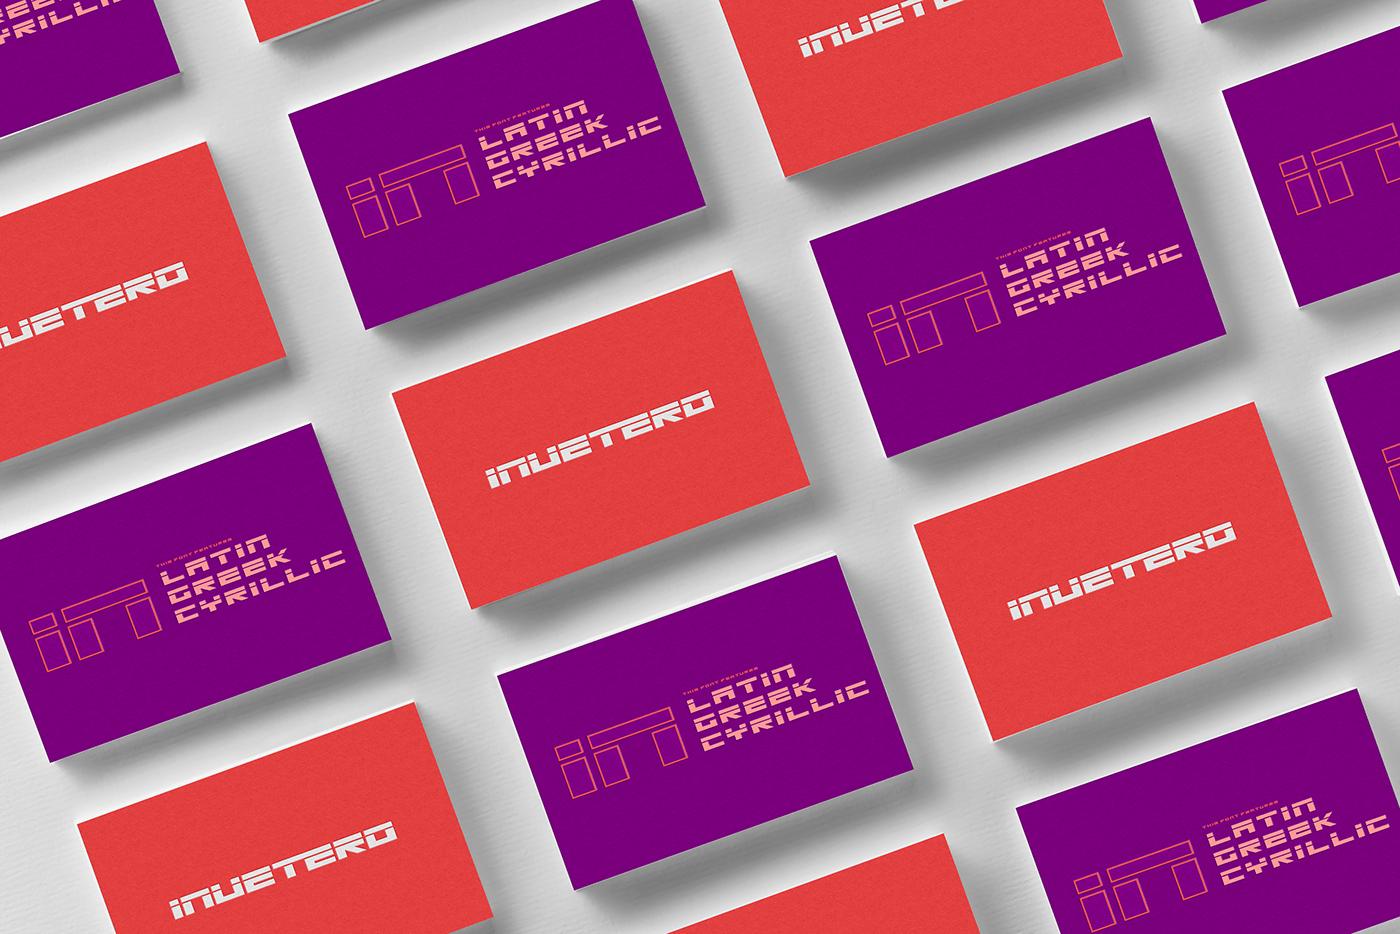 Invetero Free Font - sans-serif, decorative-display